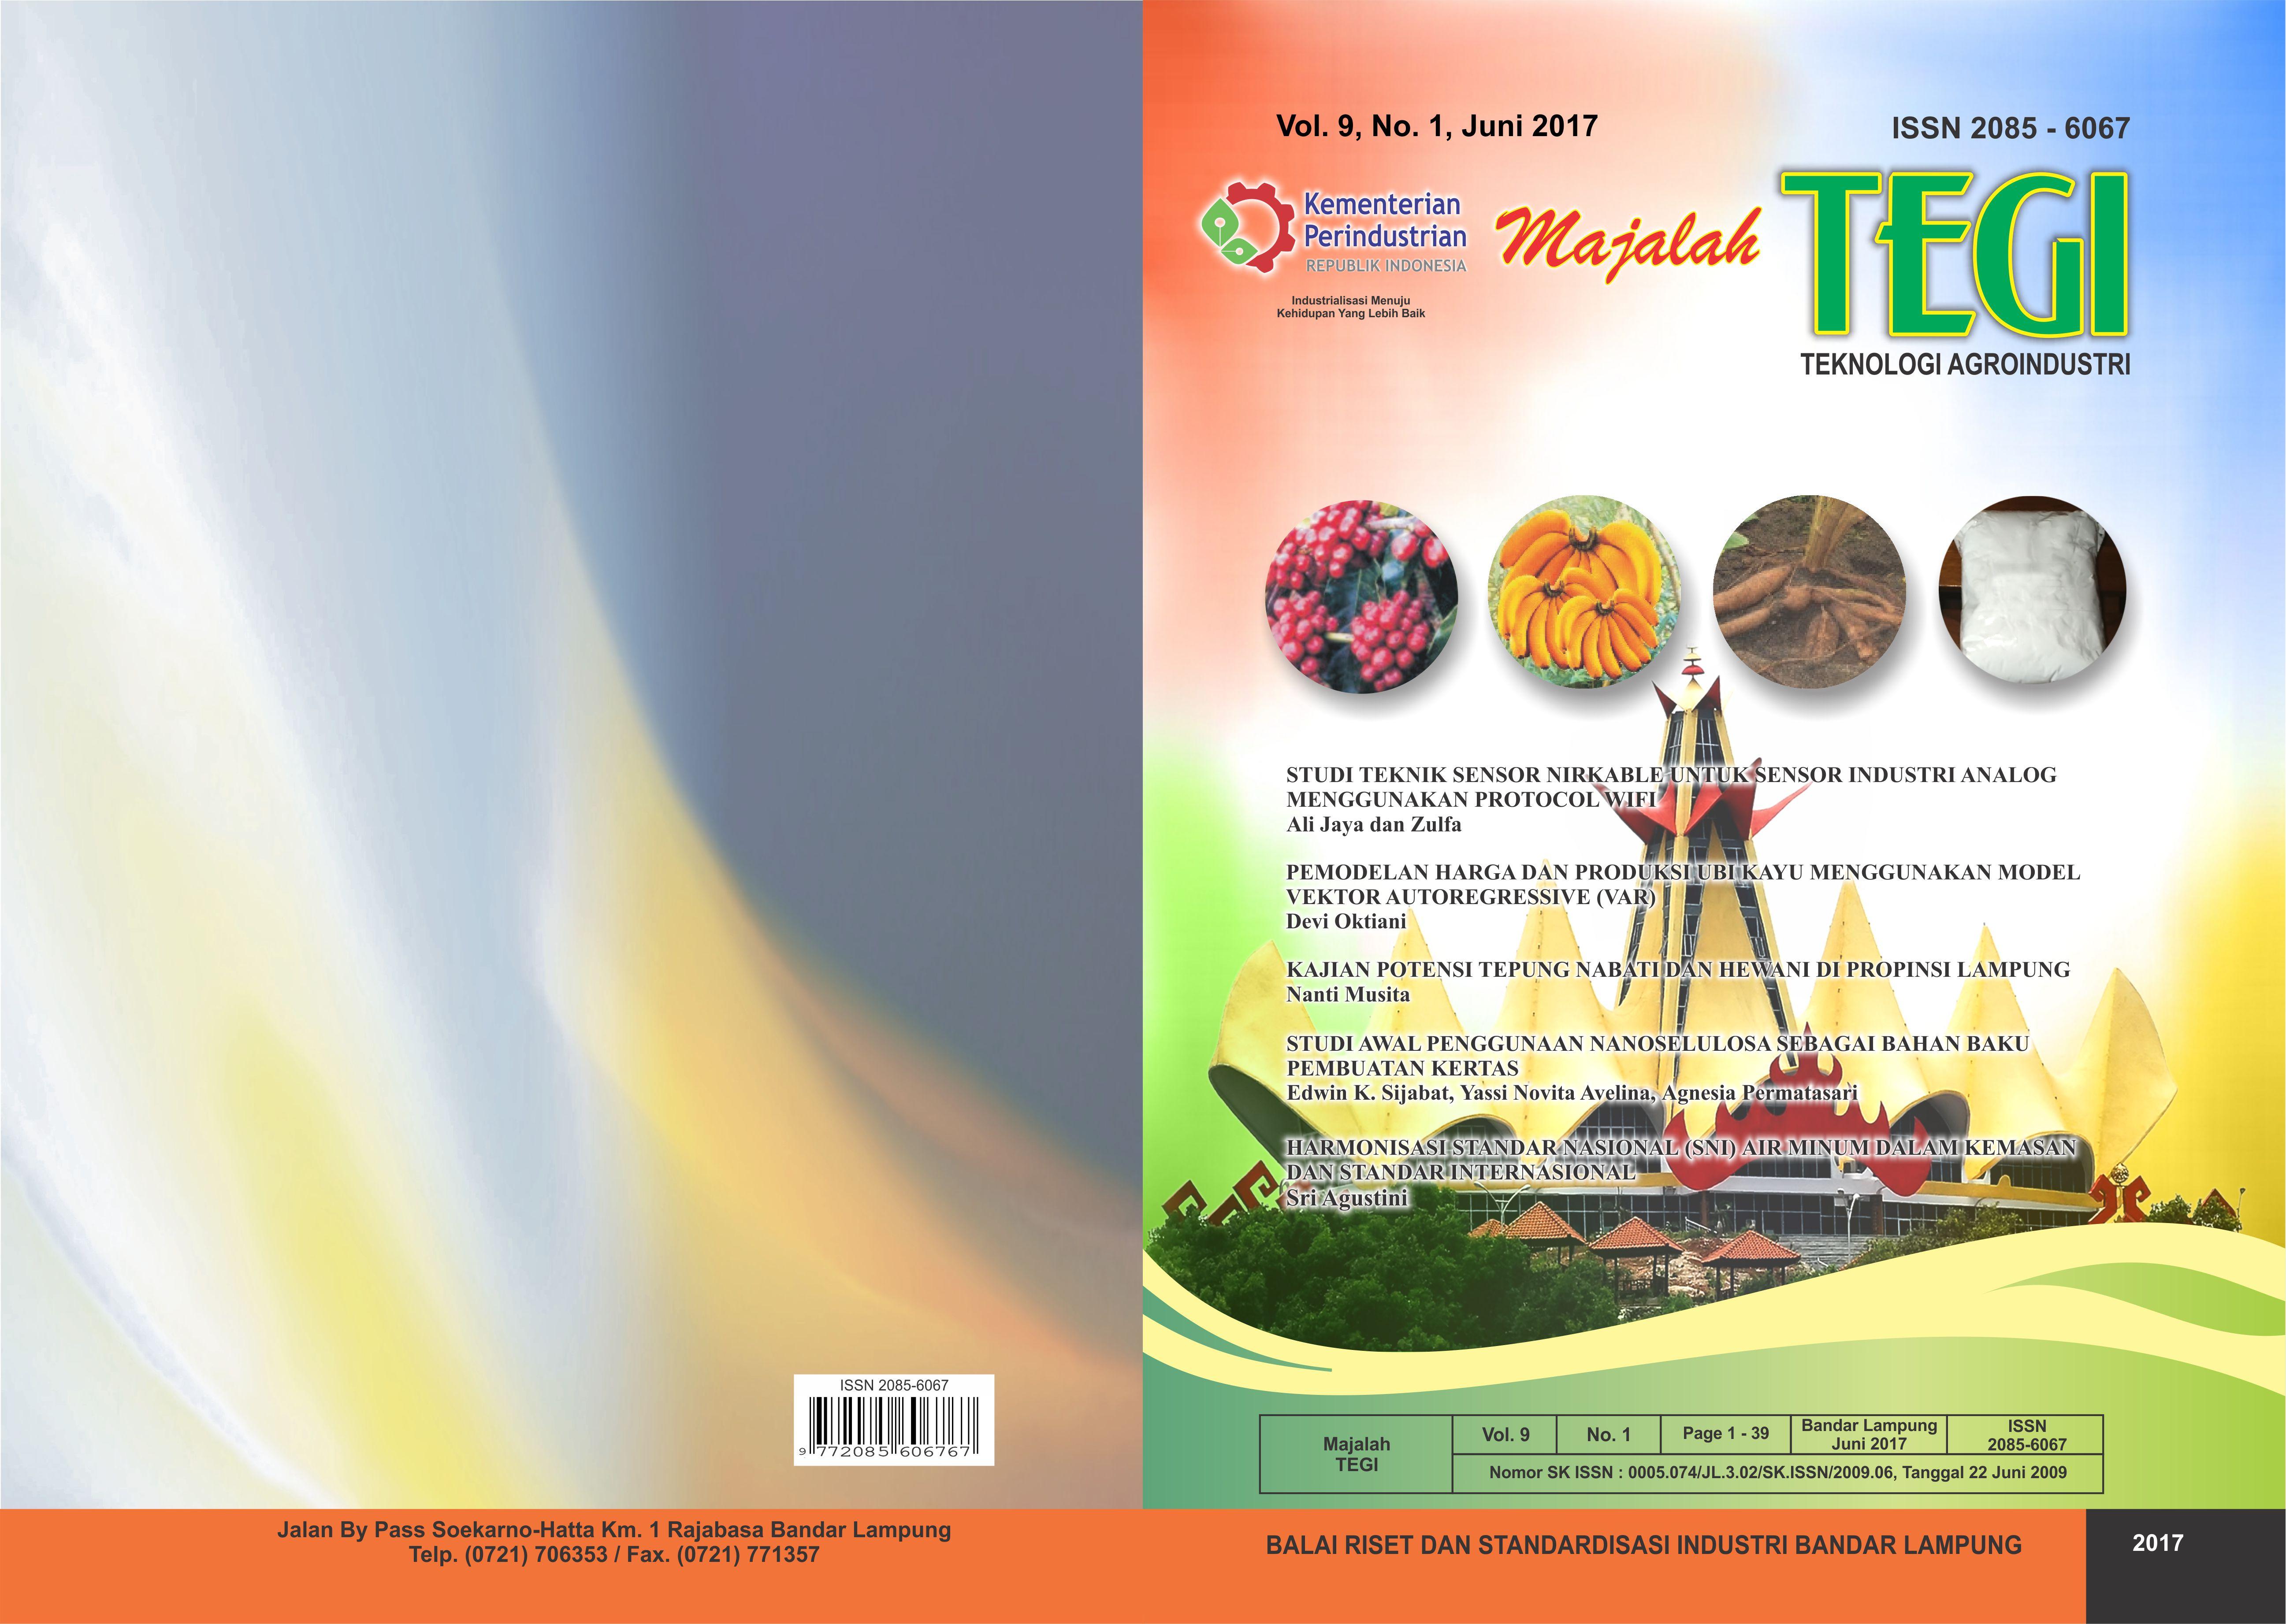 Majalah Teknologi Agroindustri